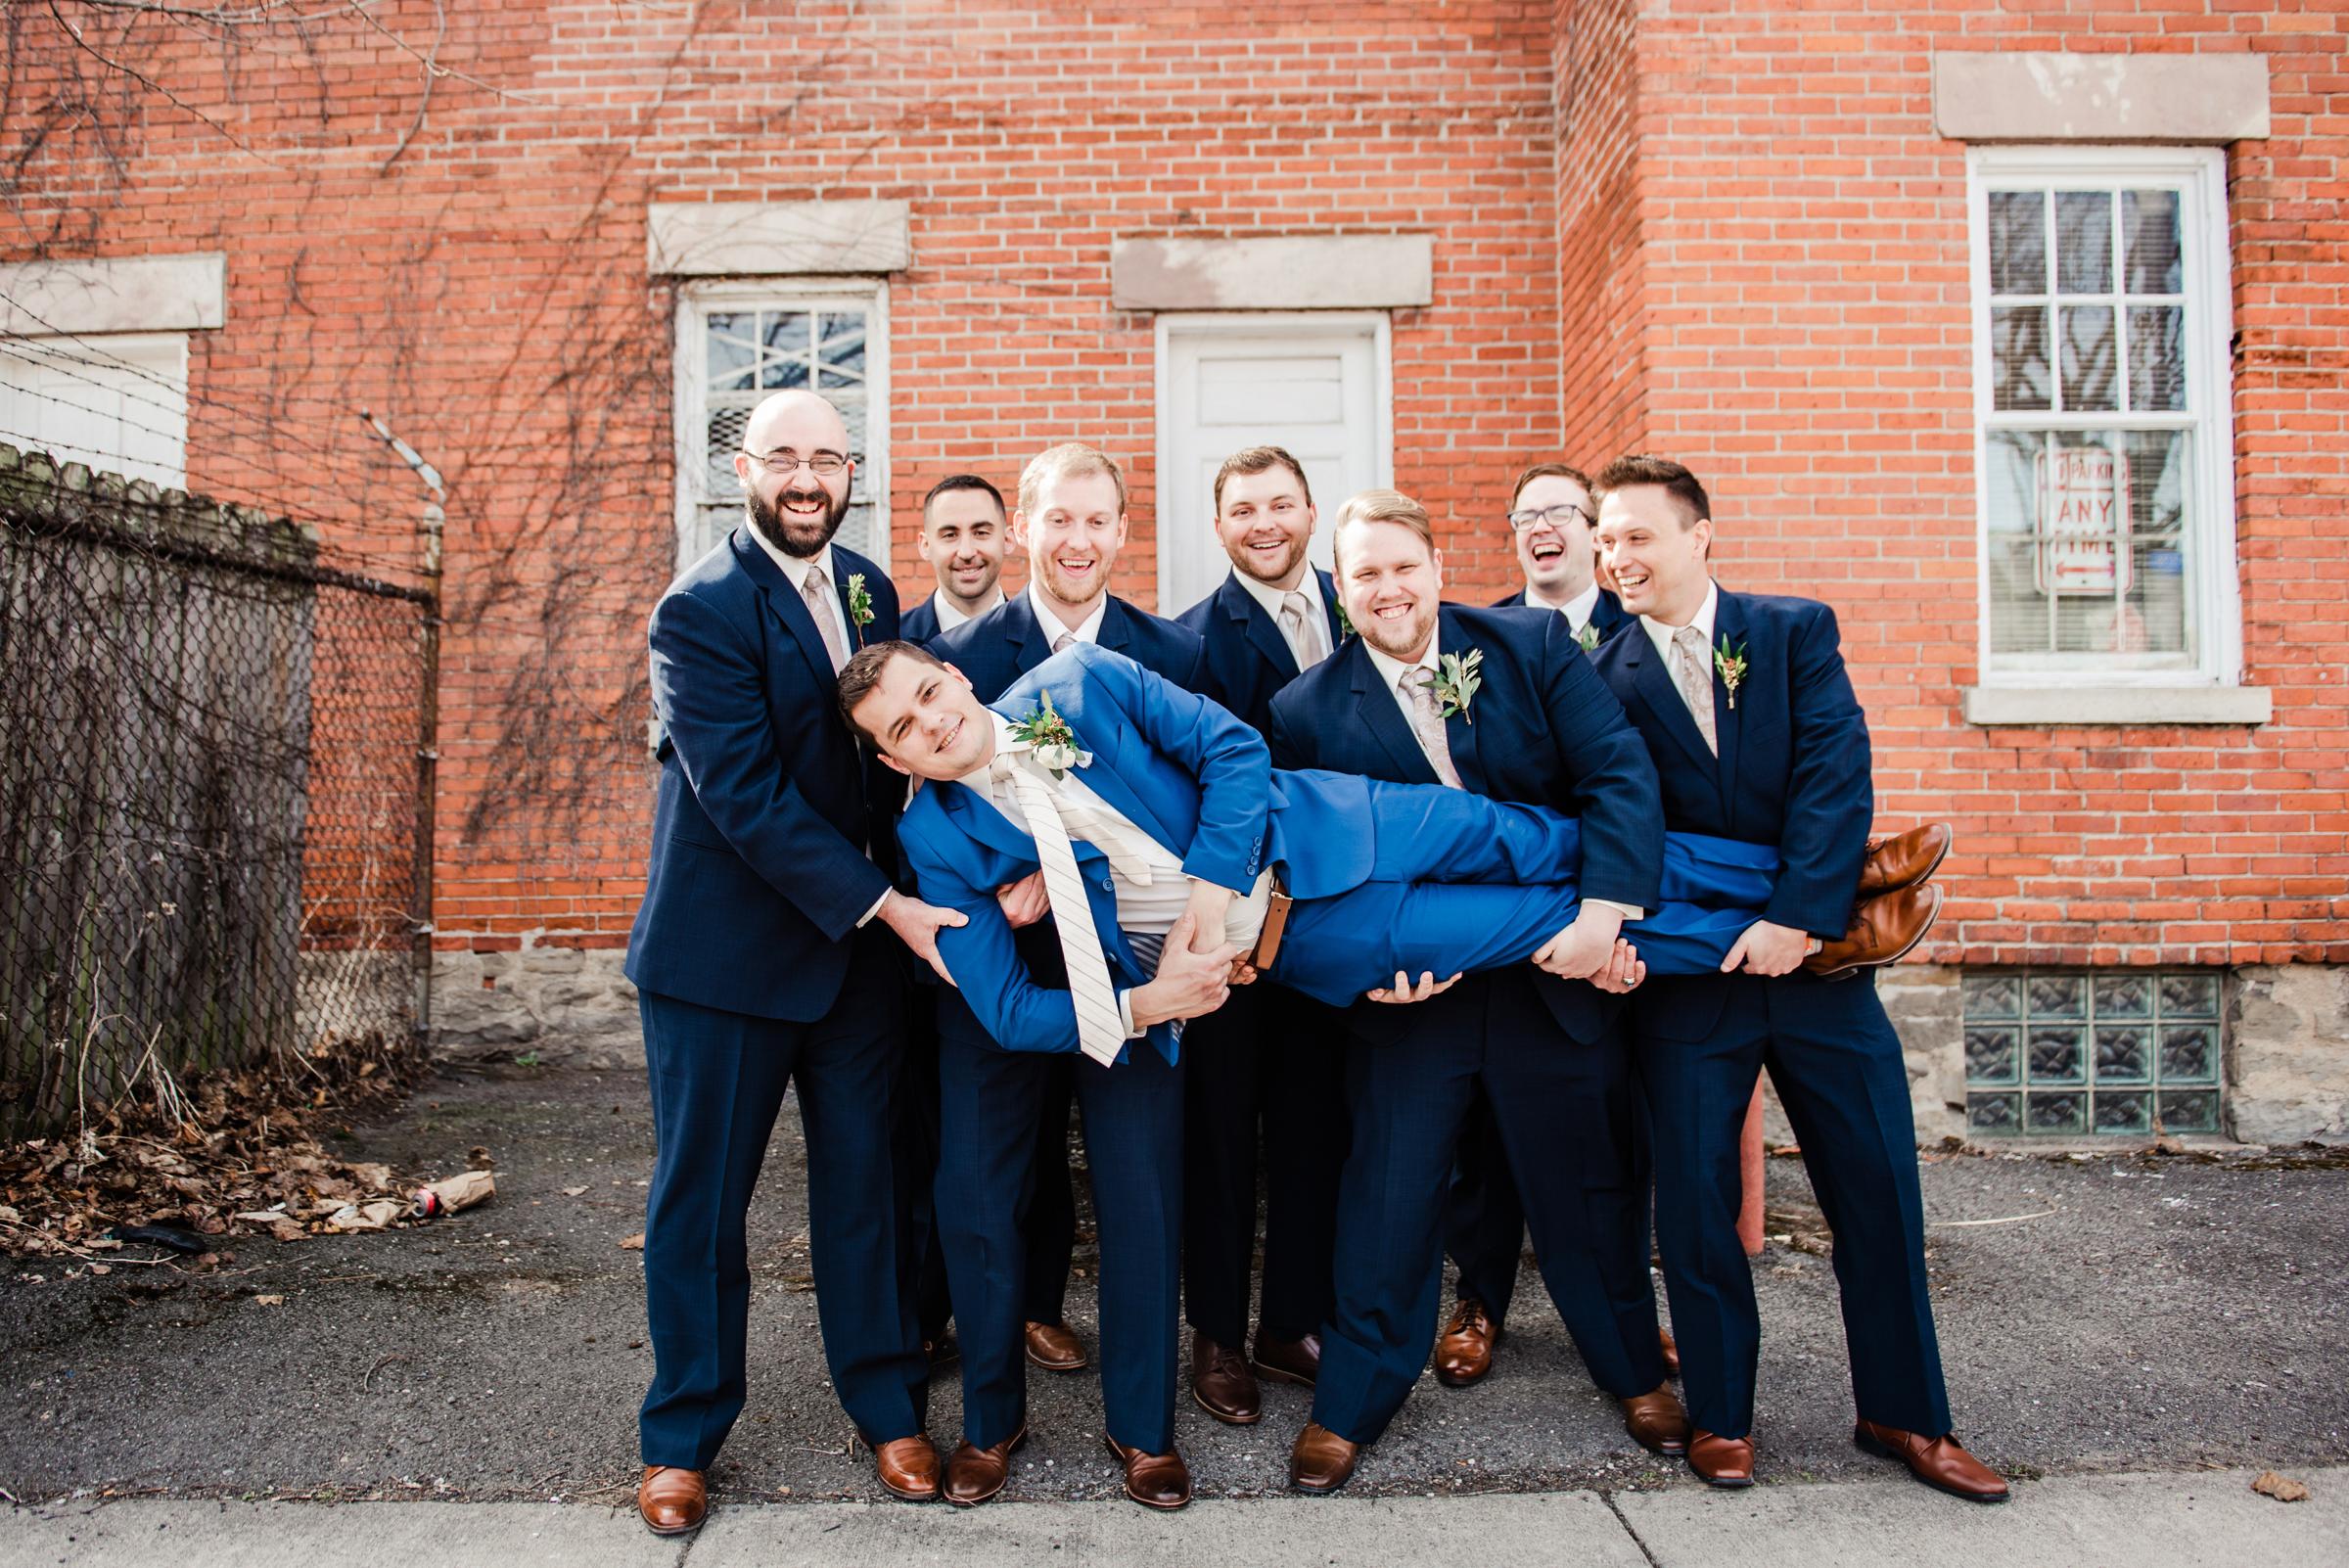 The_Arbor_LoftRochester_Wedding_JILL_STUDIO_Rochester_NY_Photographer_155143.jpg